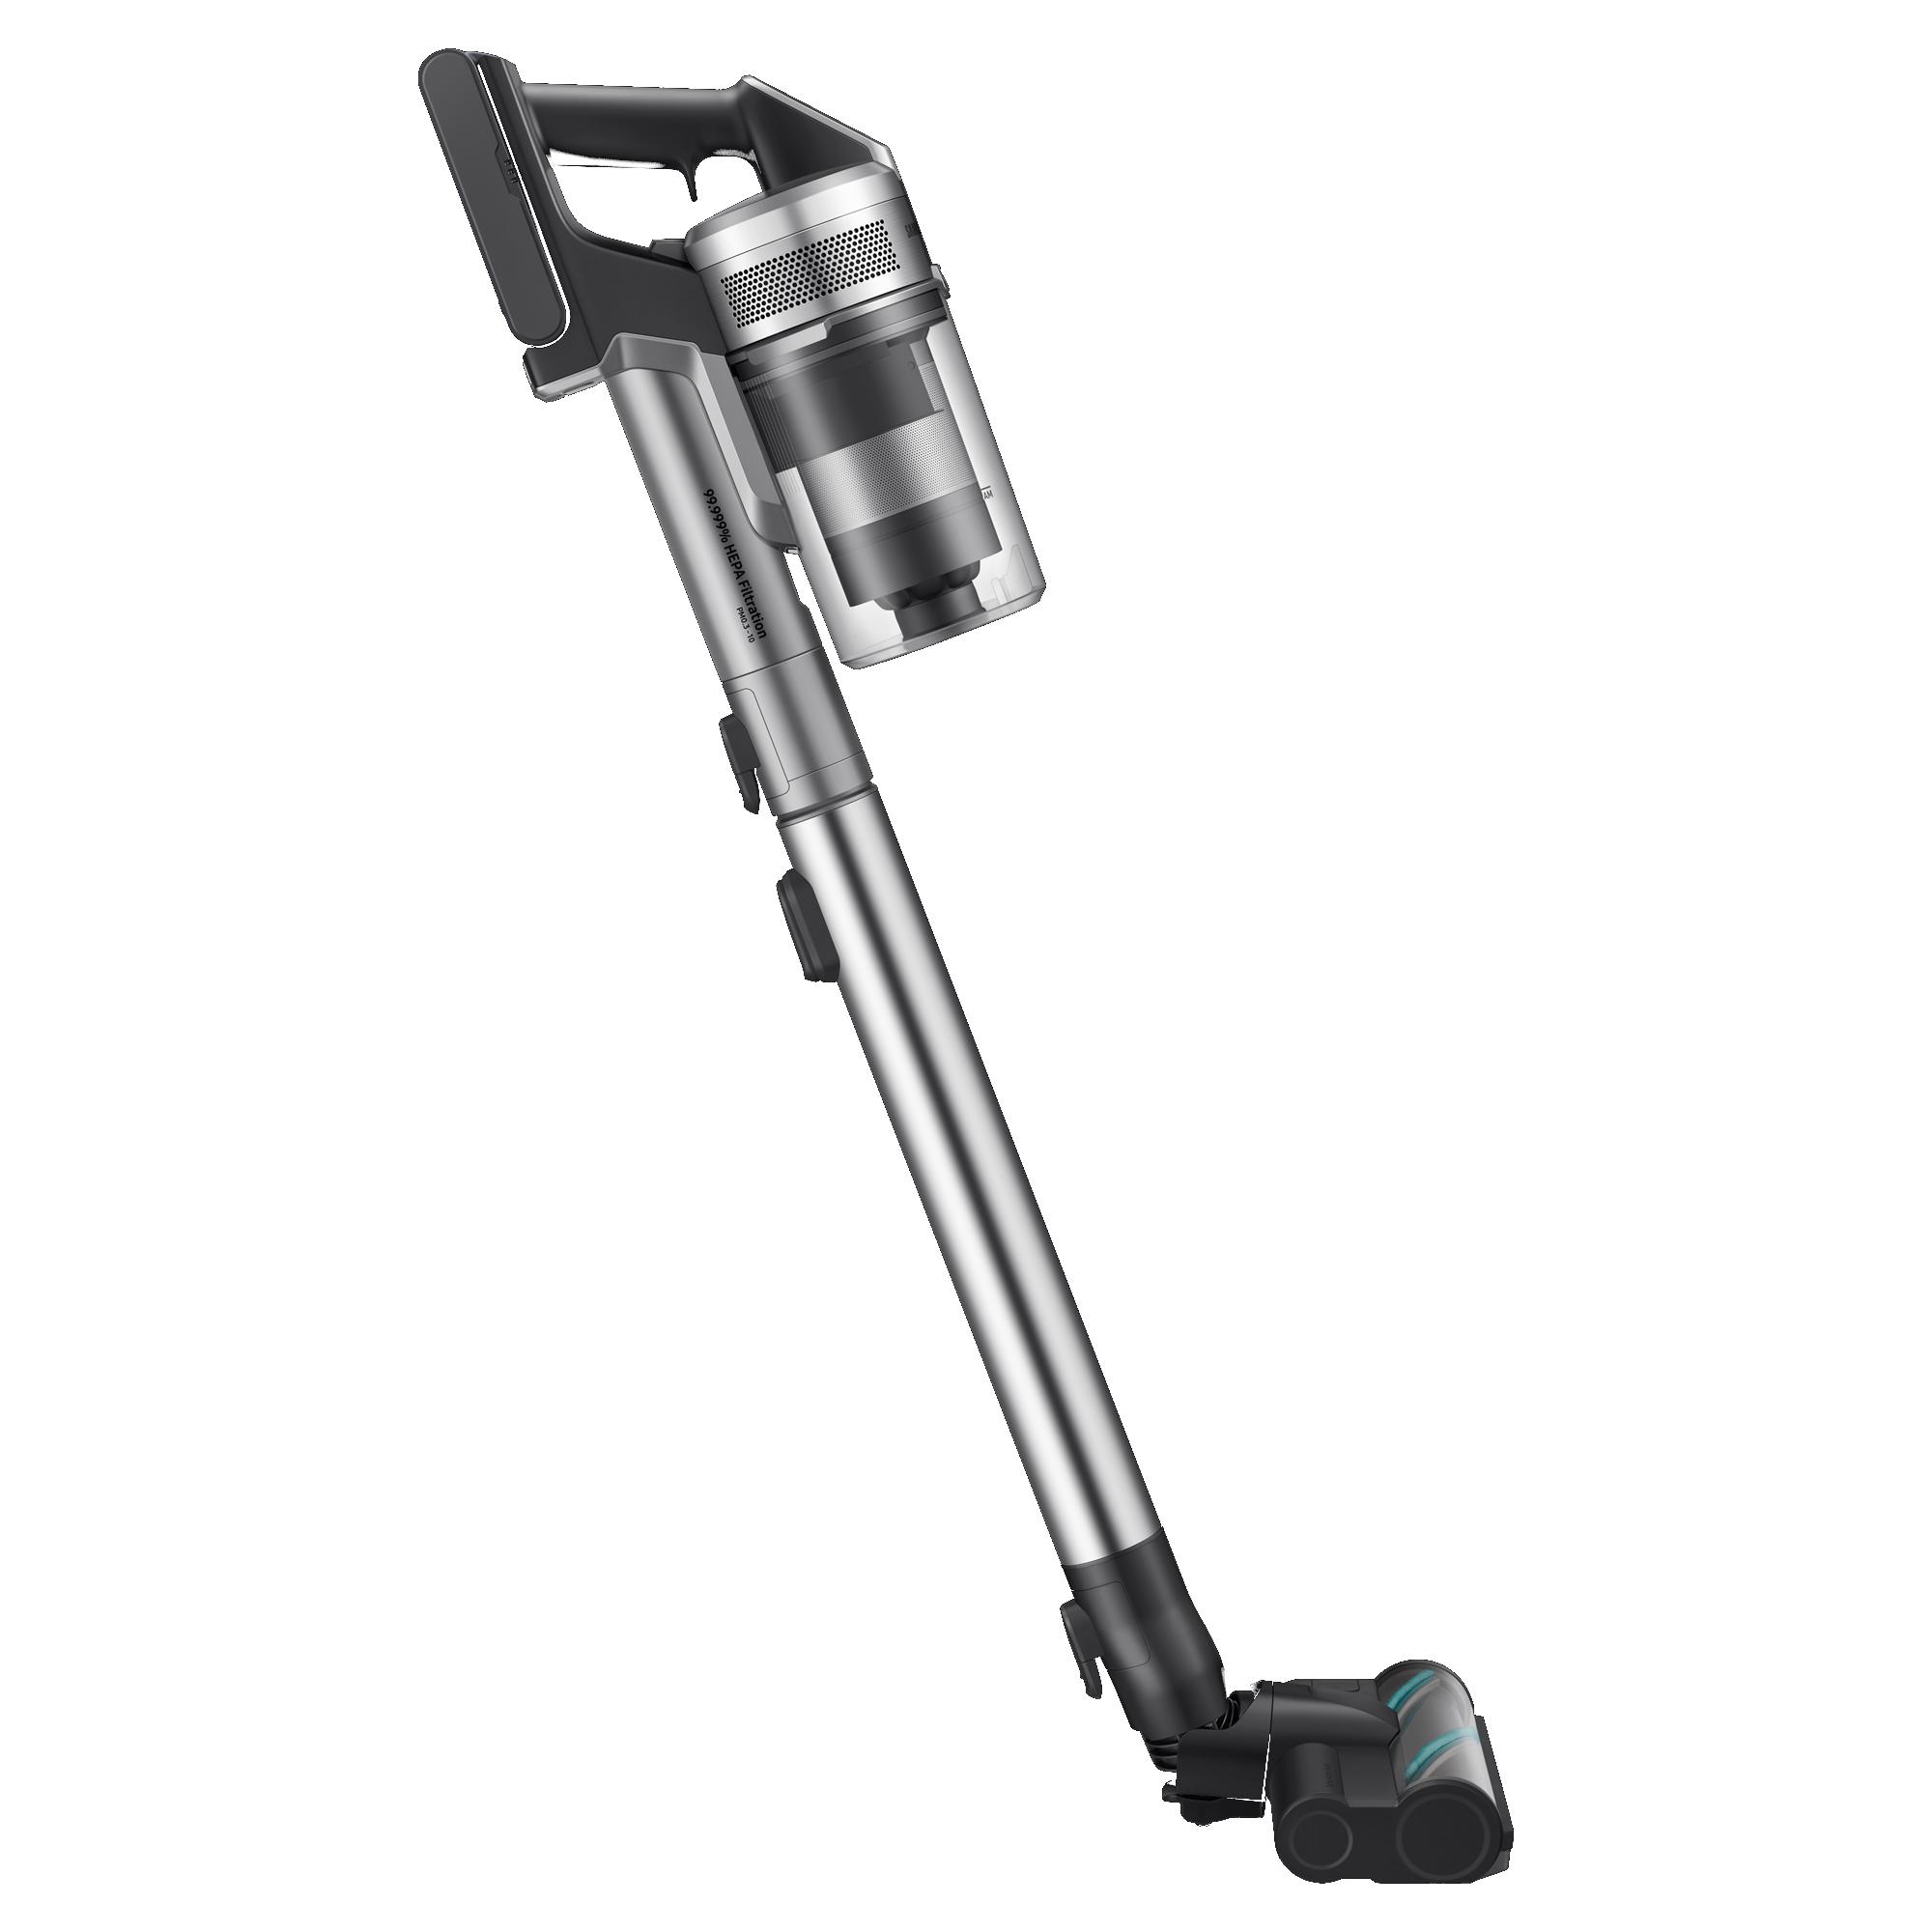 Samsung Powerstick Jet Vs20r9049s3 Cordless Vacuum With